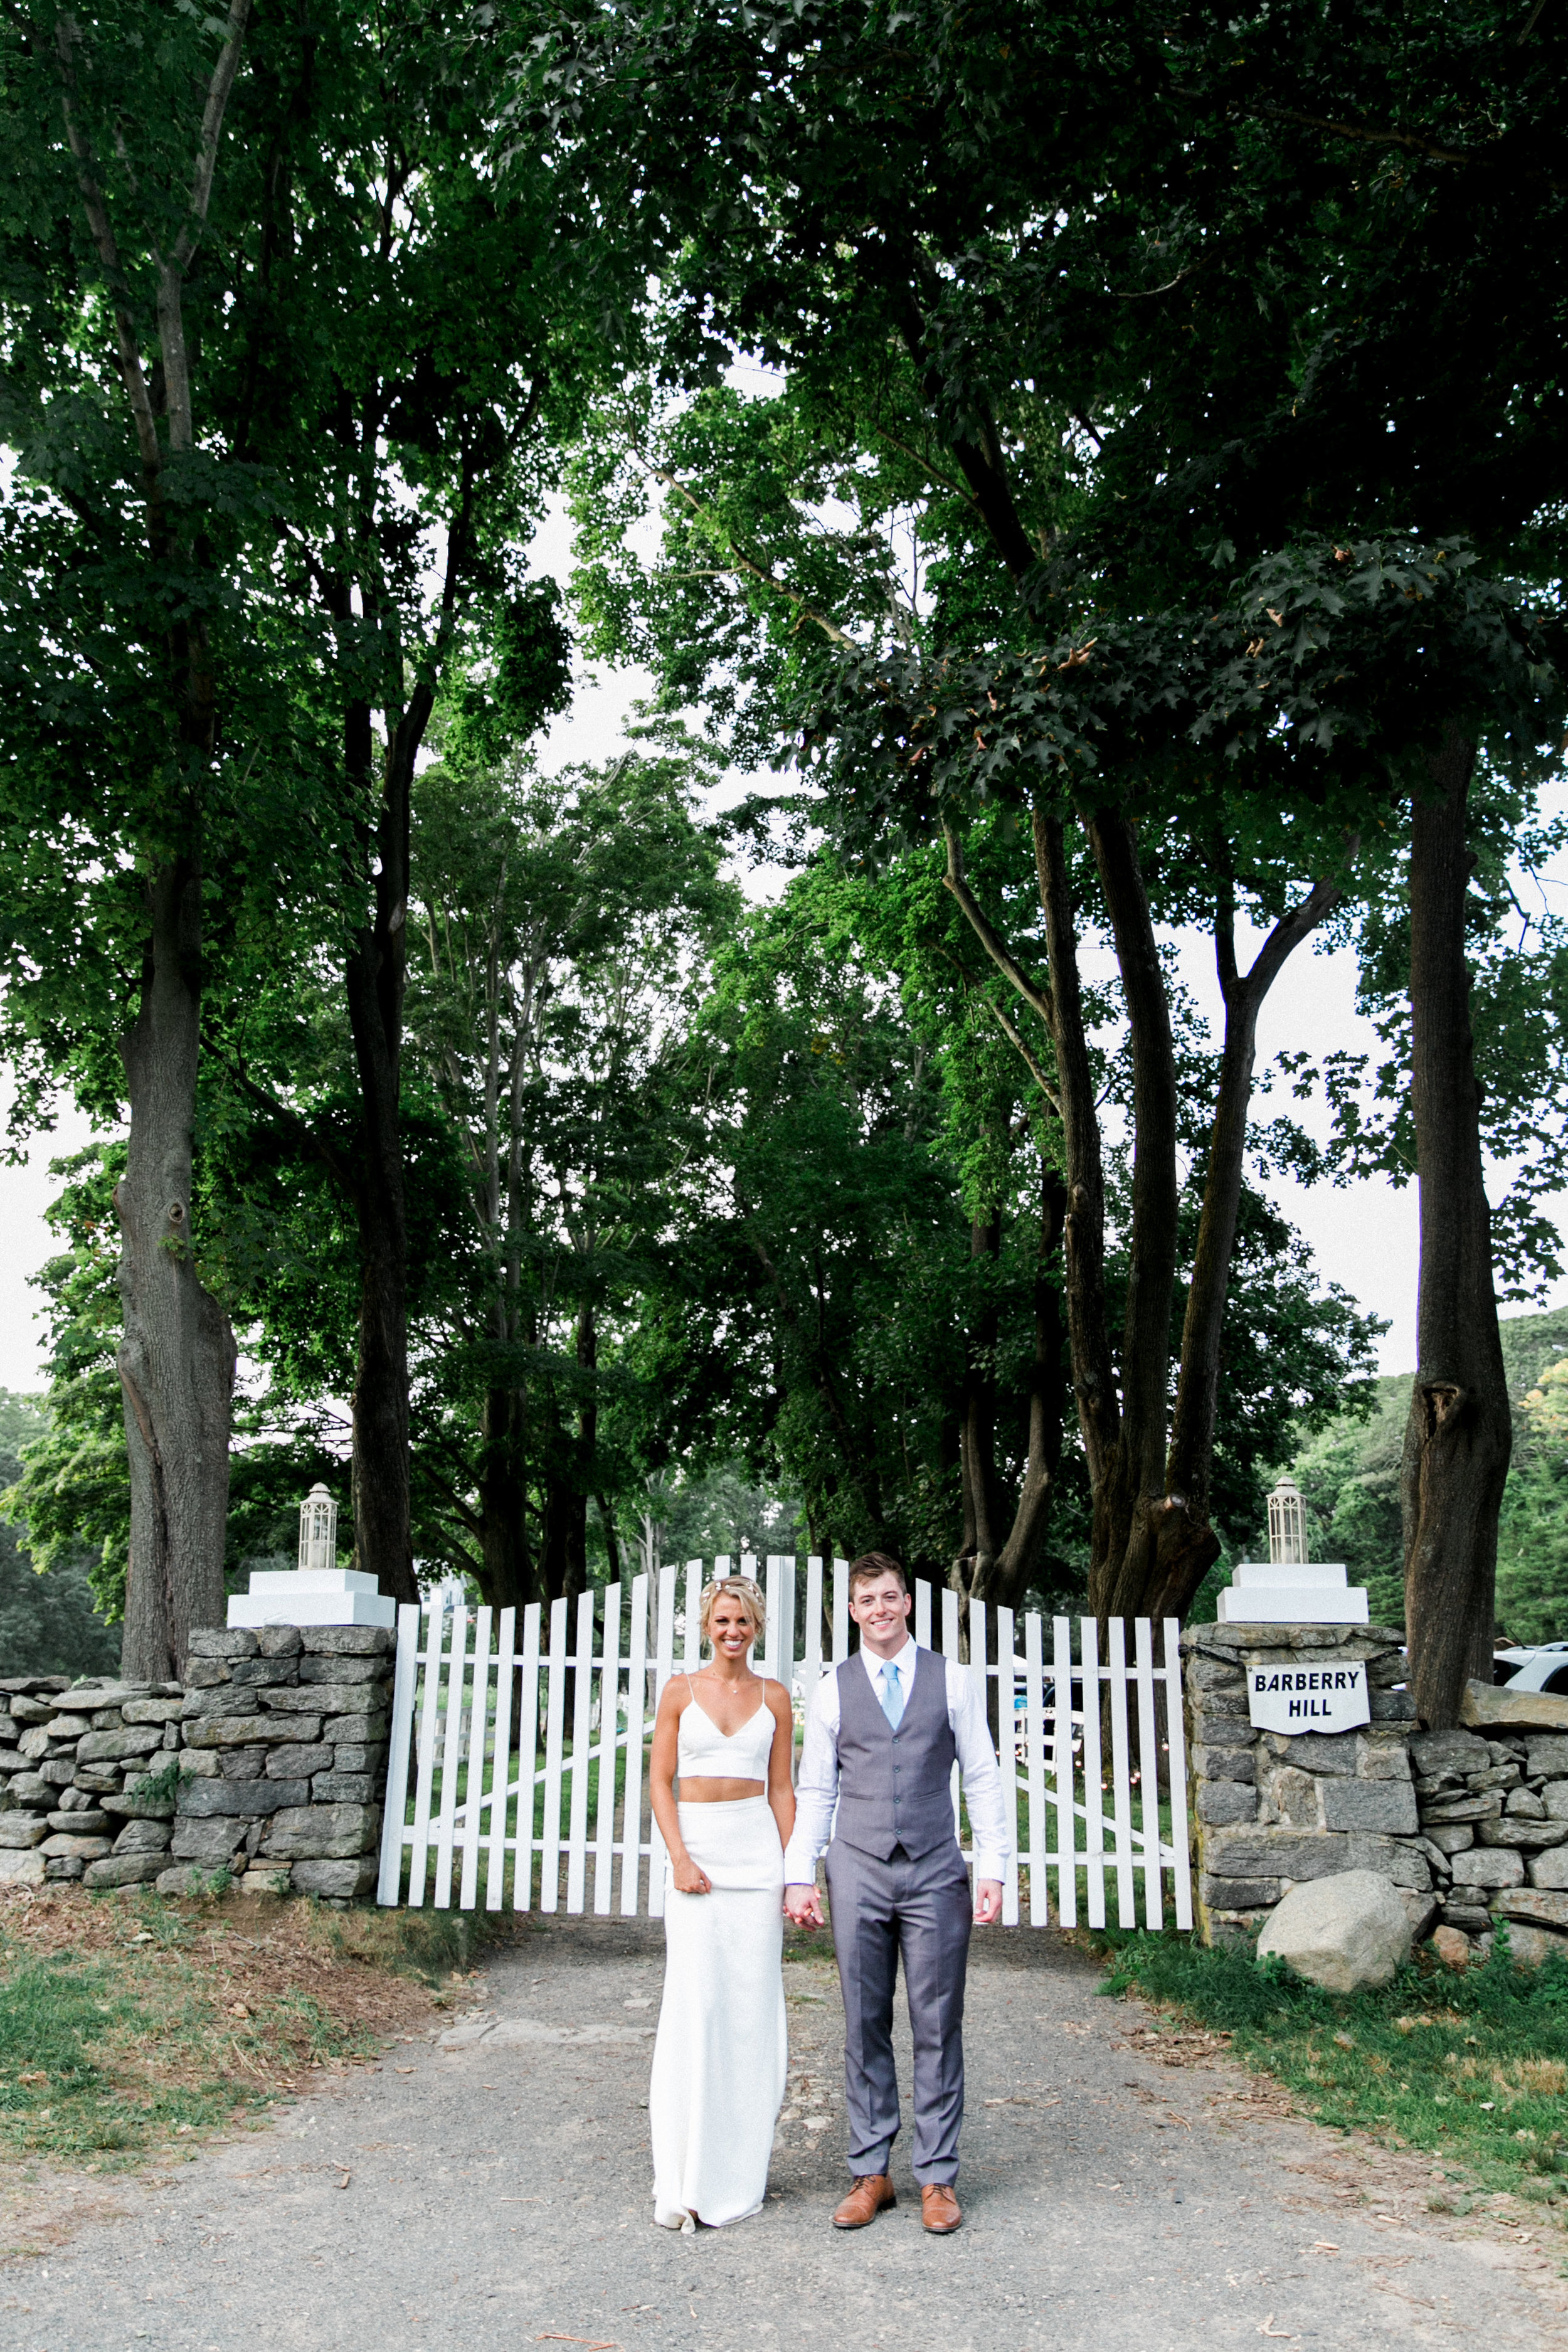 Barberry-Hill-Farm-Wedding-Madison-CT-Emily-and-Dan-August-2018-Connecticut-Wedd-0006.jpg